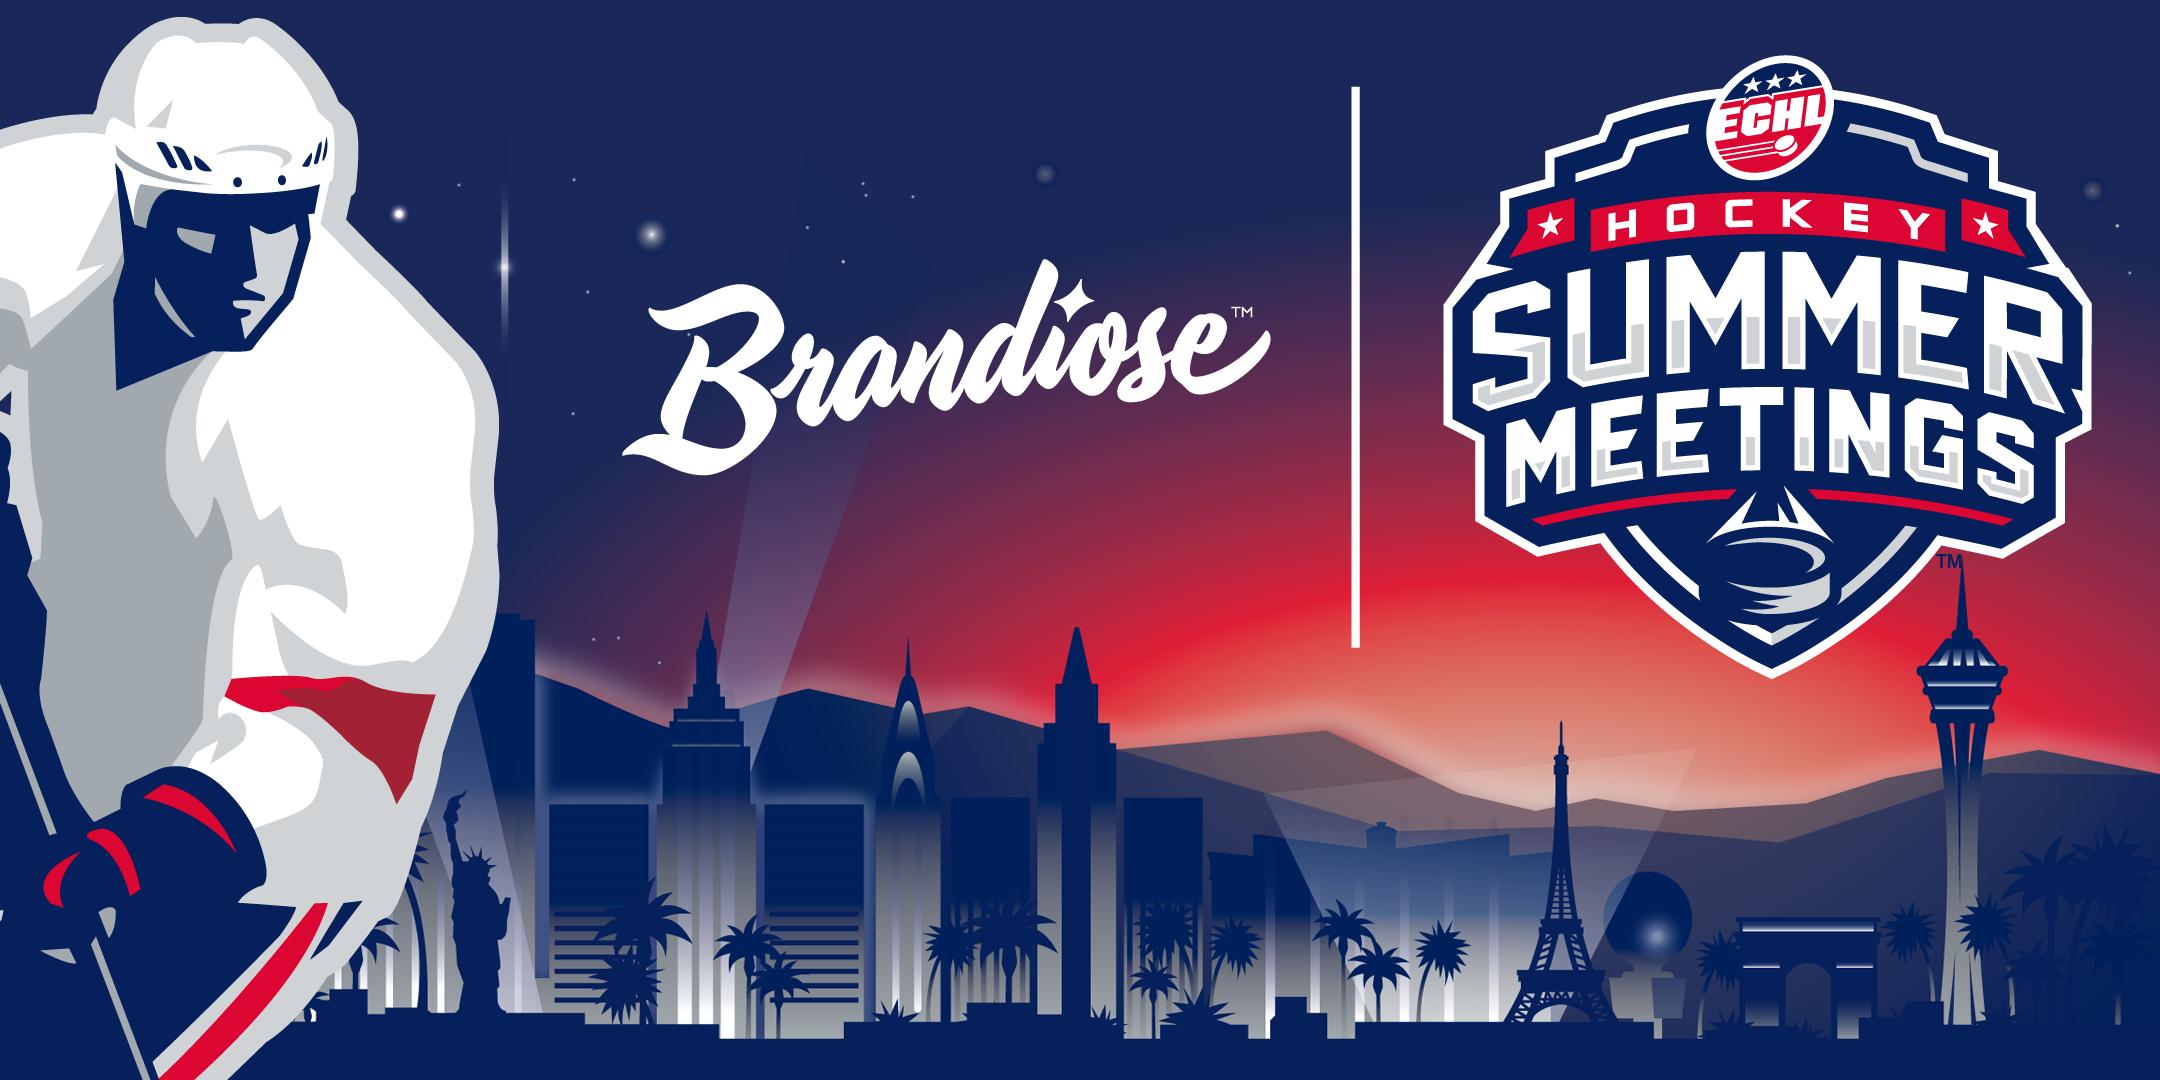 ECHL, Brandiose partner to brand hockey summer meetings